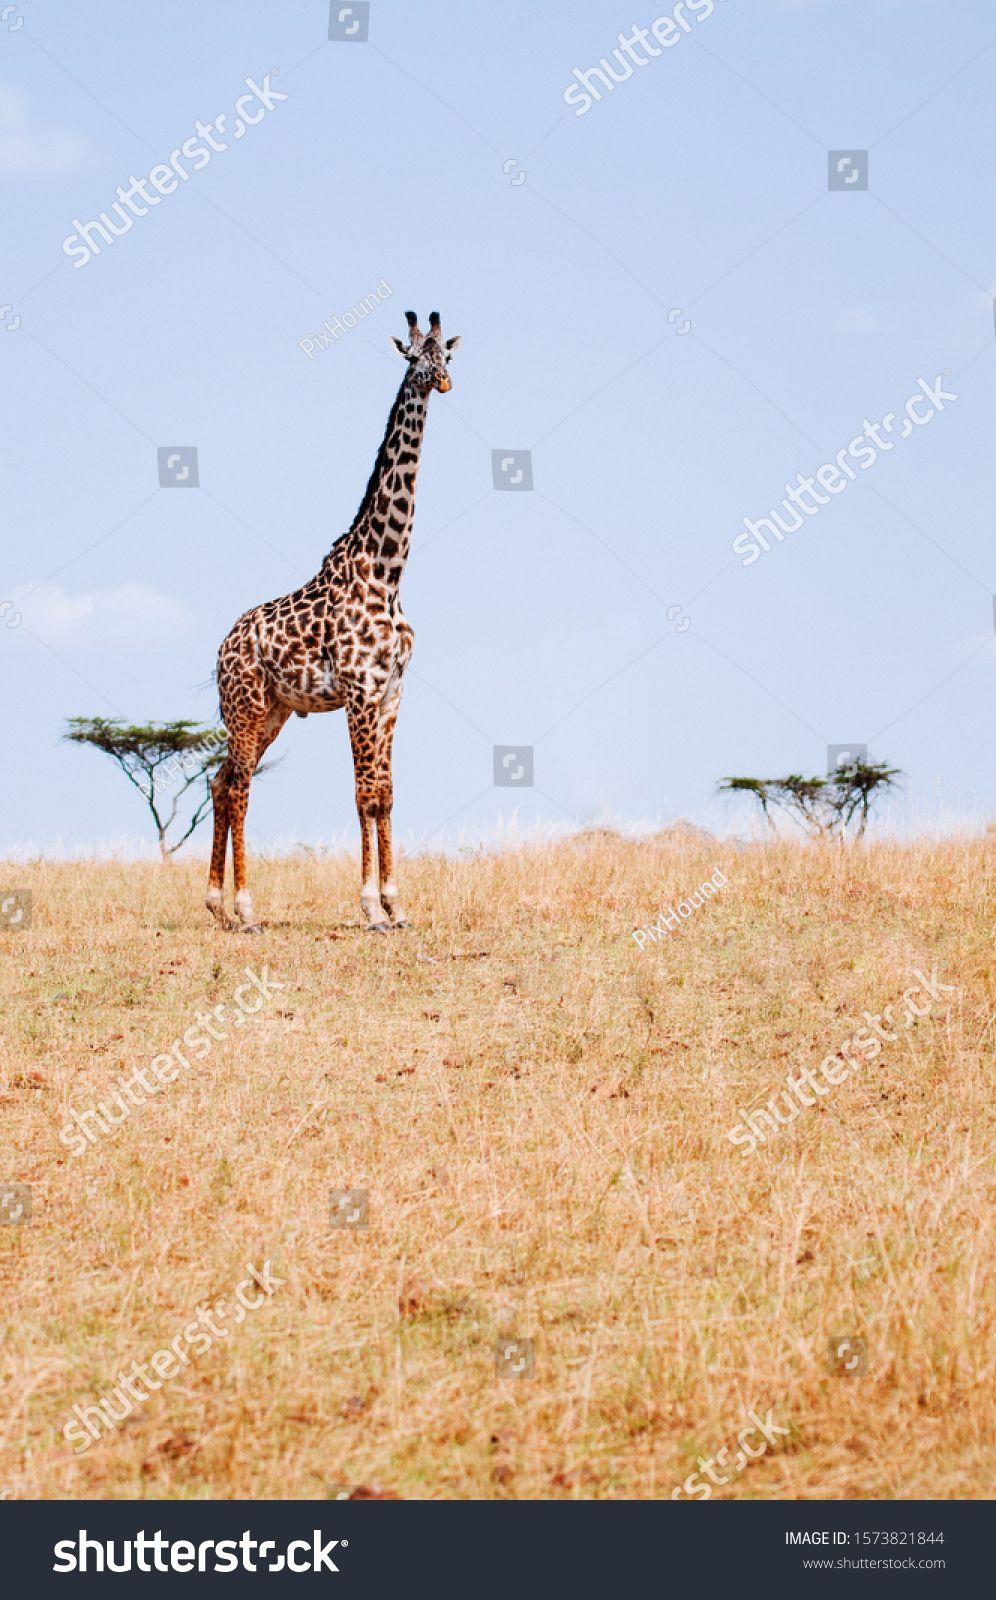 Giraffe walking in golden grass field of Serengeti Grumeti reserve Savanna forest - African Tanzania Safari wildlife trip during great migration #Ad , #spon, #Serengeti#field#reserve#Grumeti